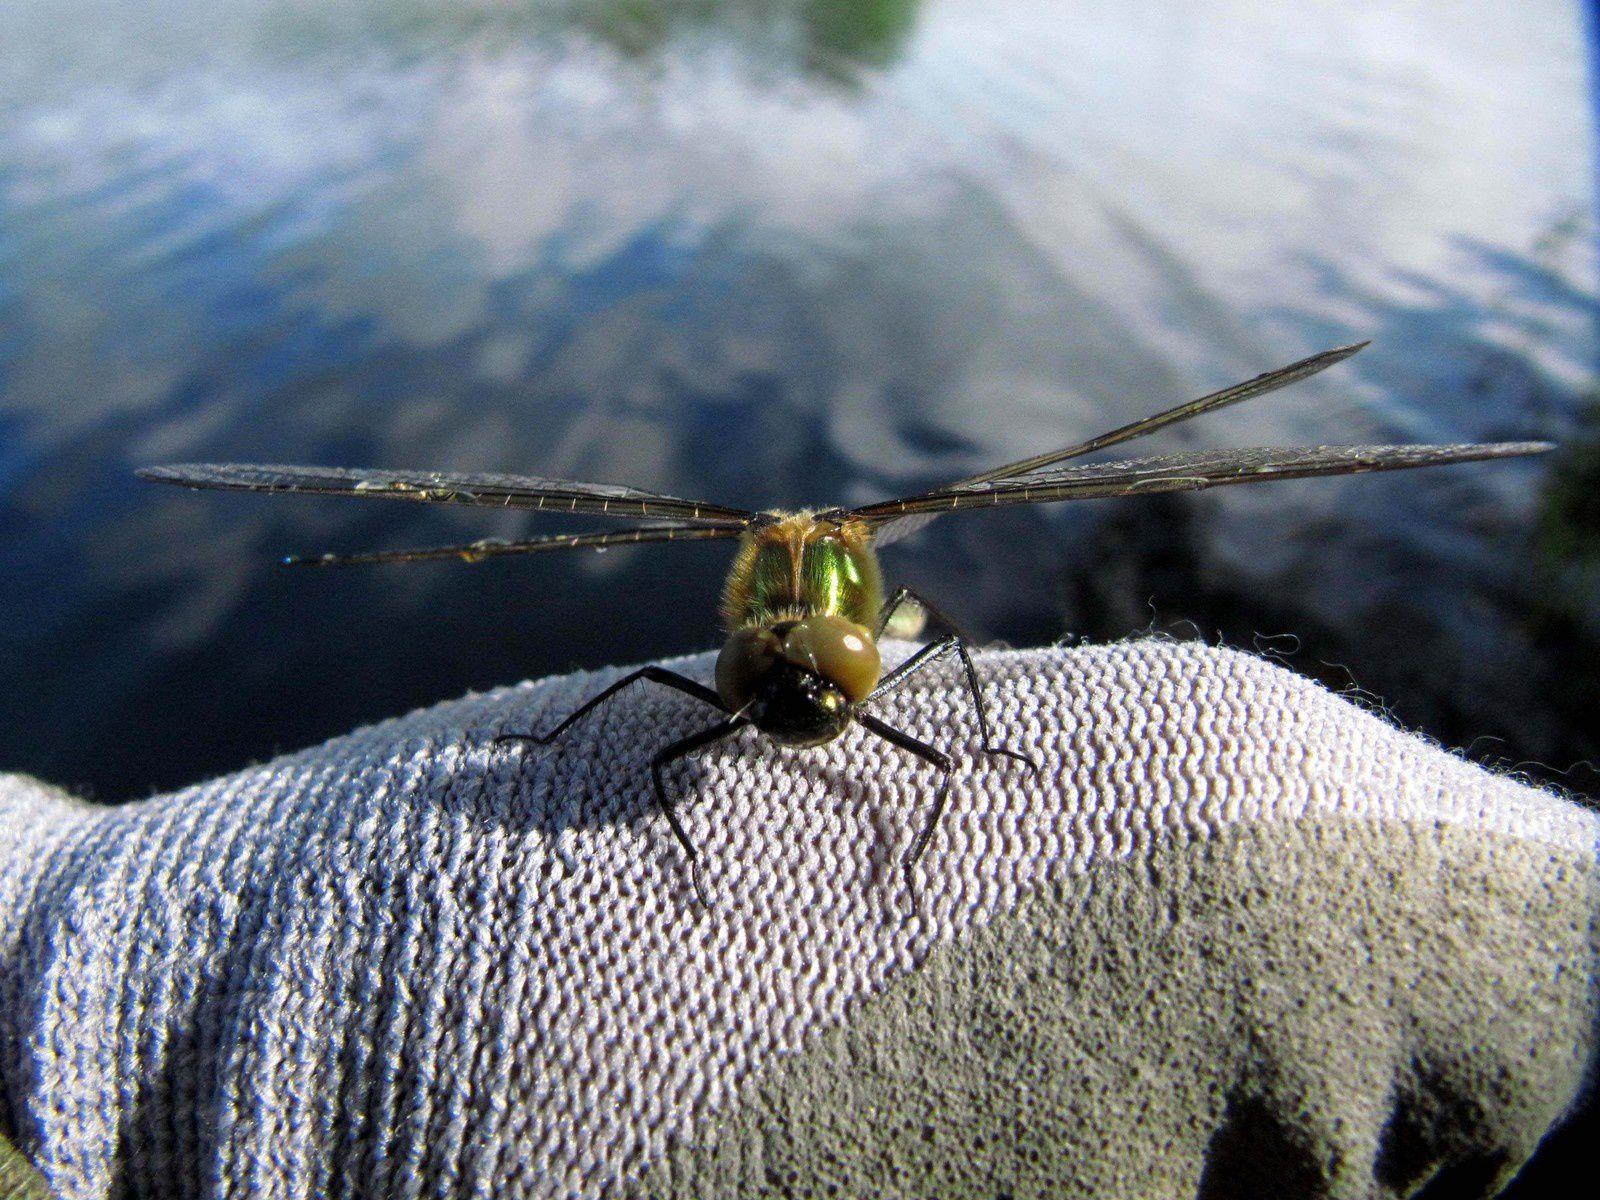 Le premier vol de la libellule ( Cordulie bronzéee, Cordulia aenea )